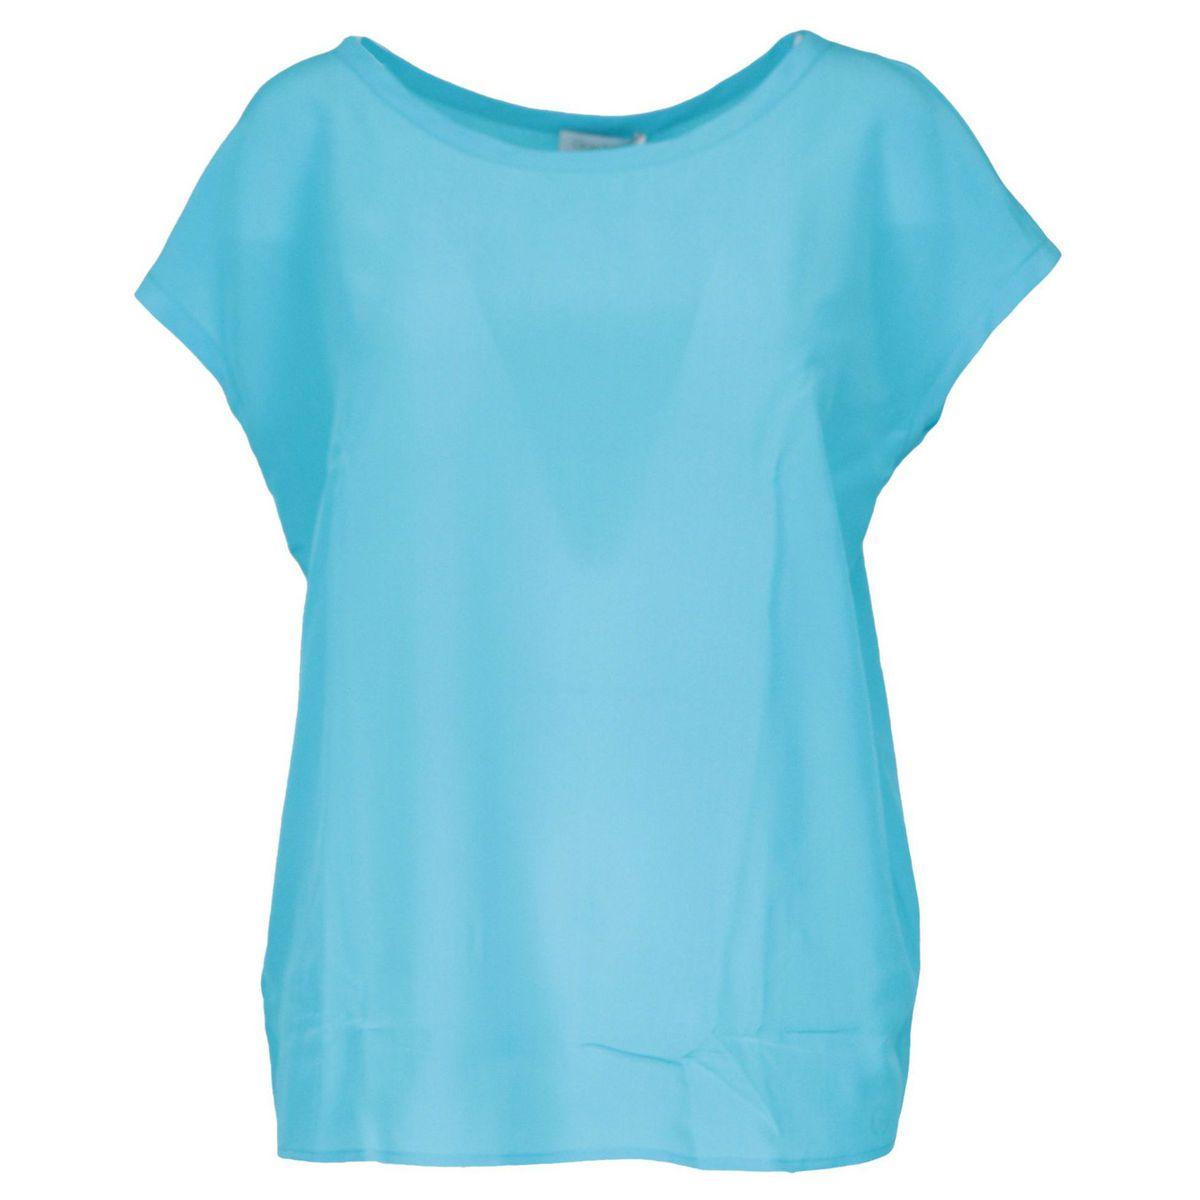 Crew neck silk sweater with cap sleeves Turquoise Gran Sasso